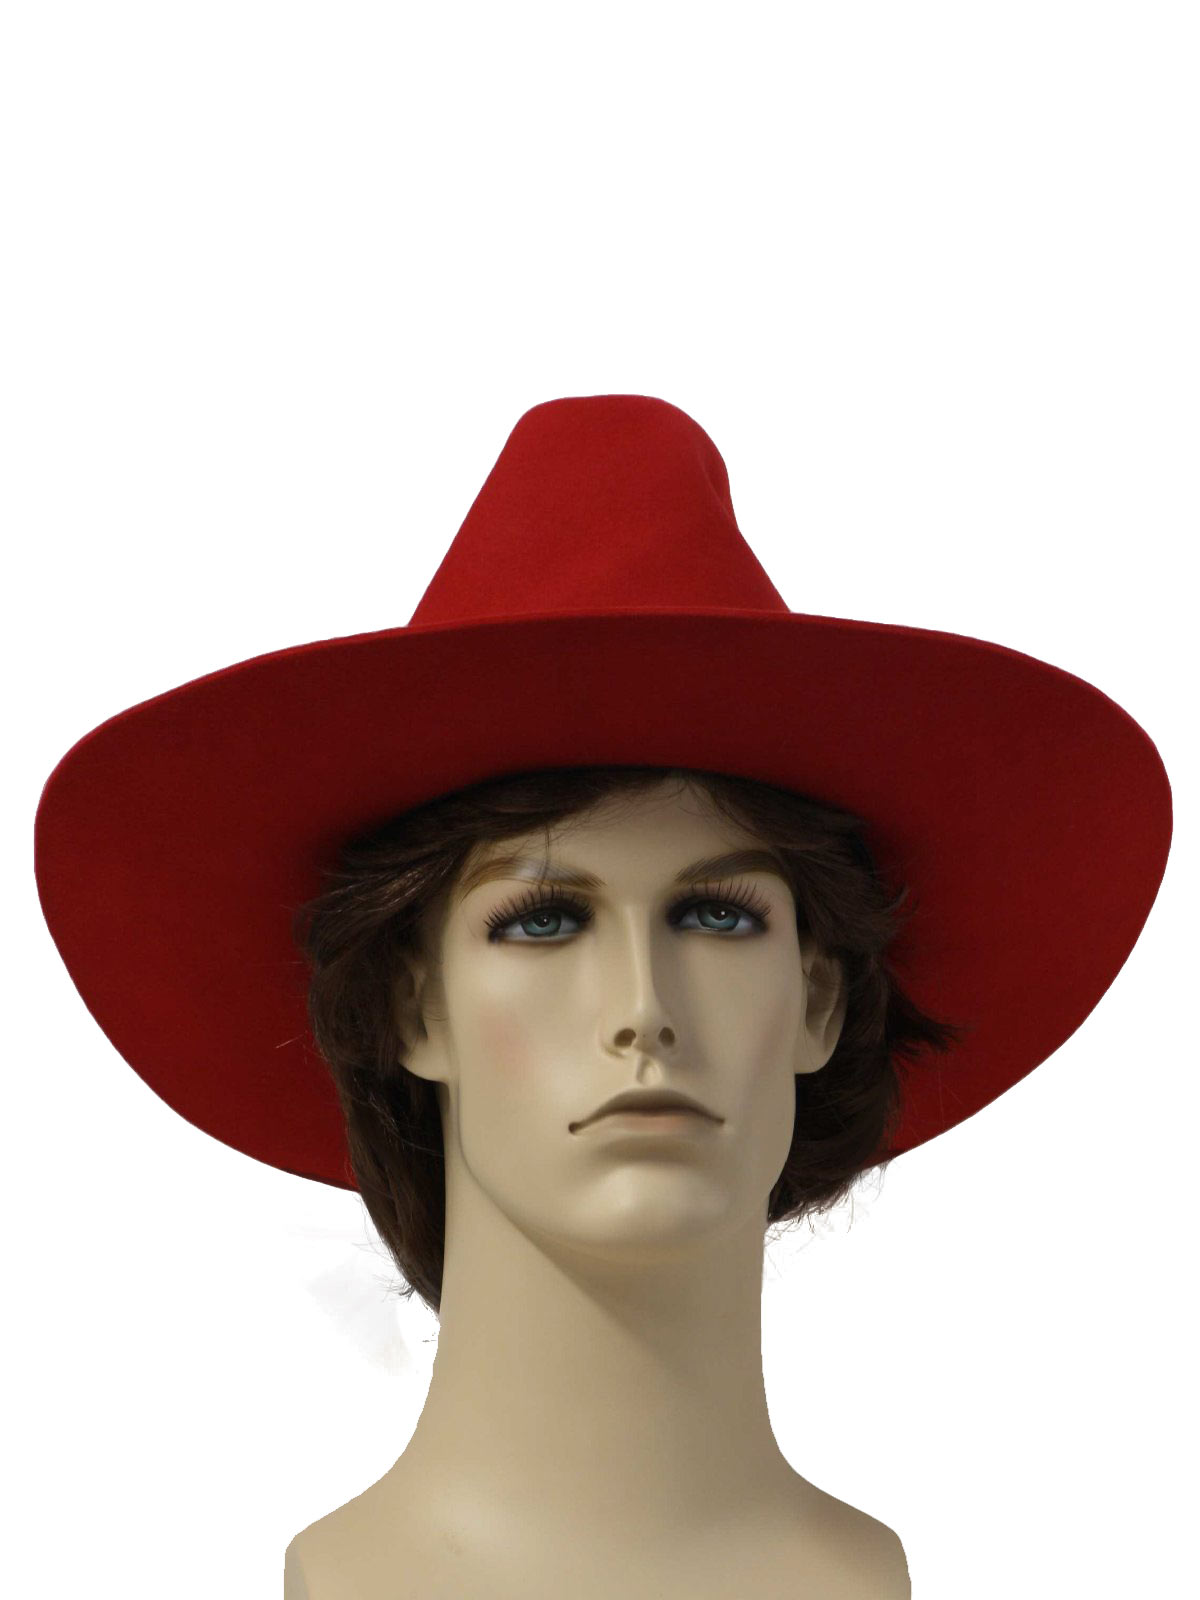 Seventies Baileys Premier Hat  70s -Baileys Premier- Mens red 6X ... d2f9a6f574b